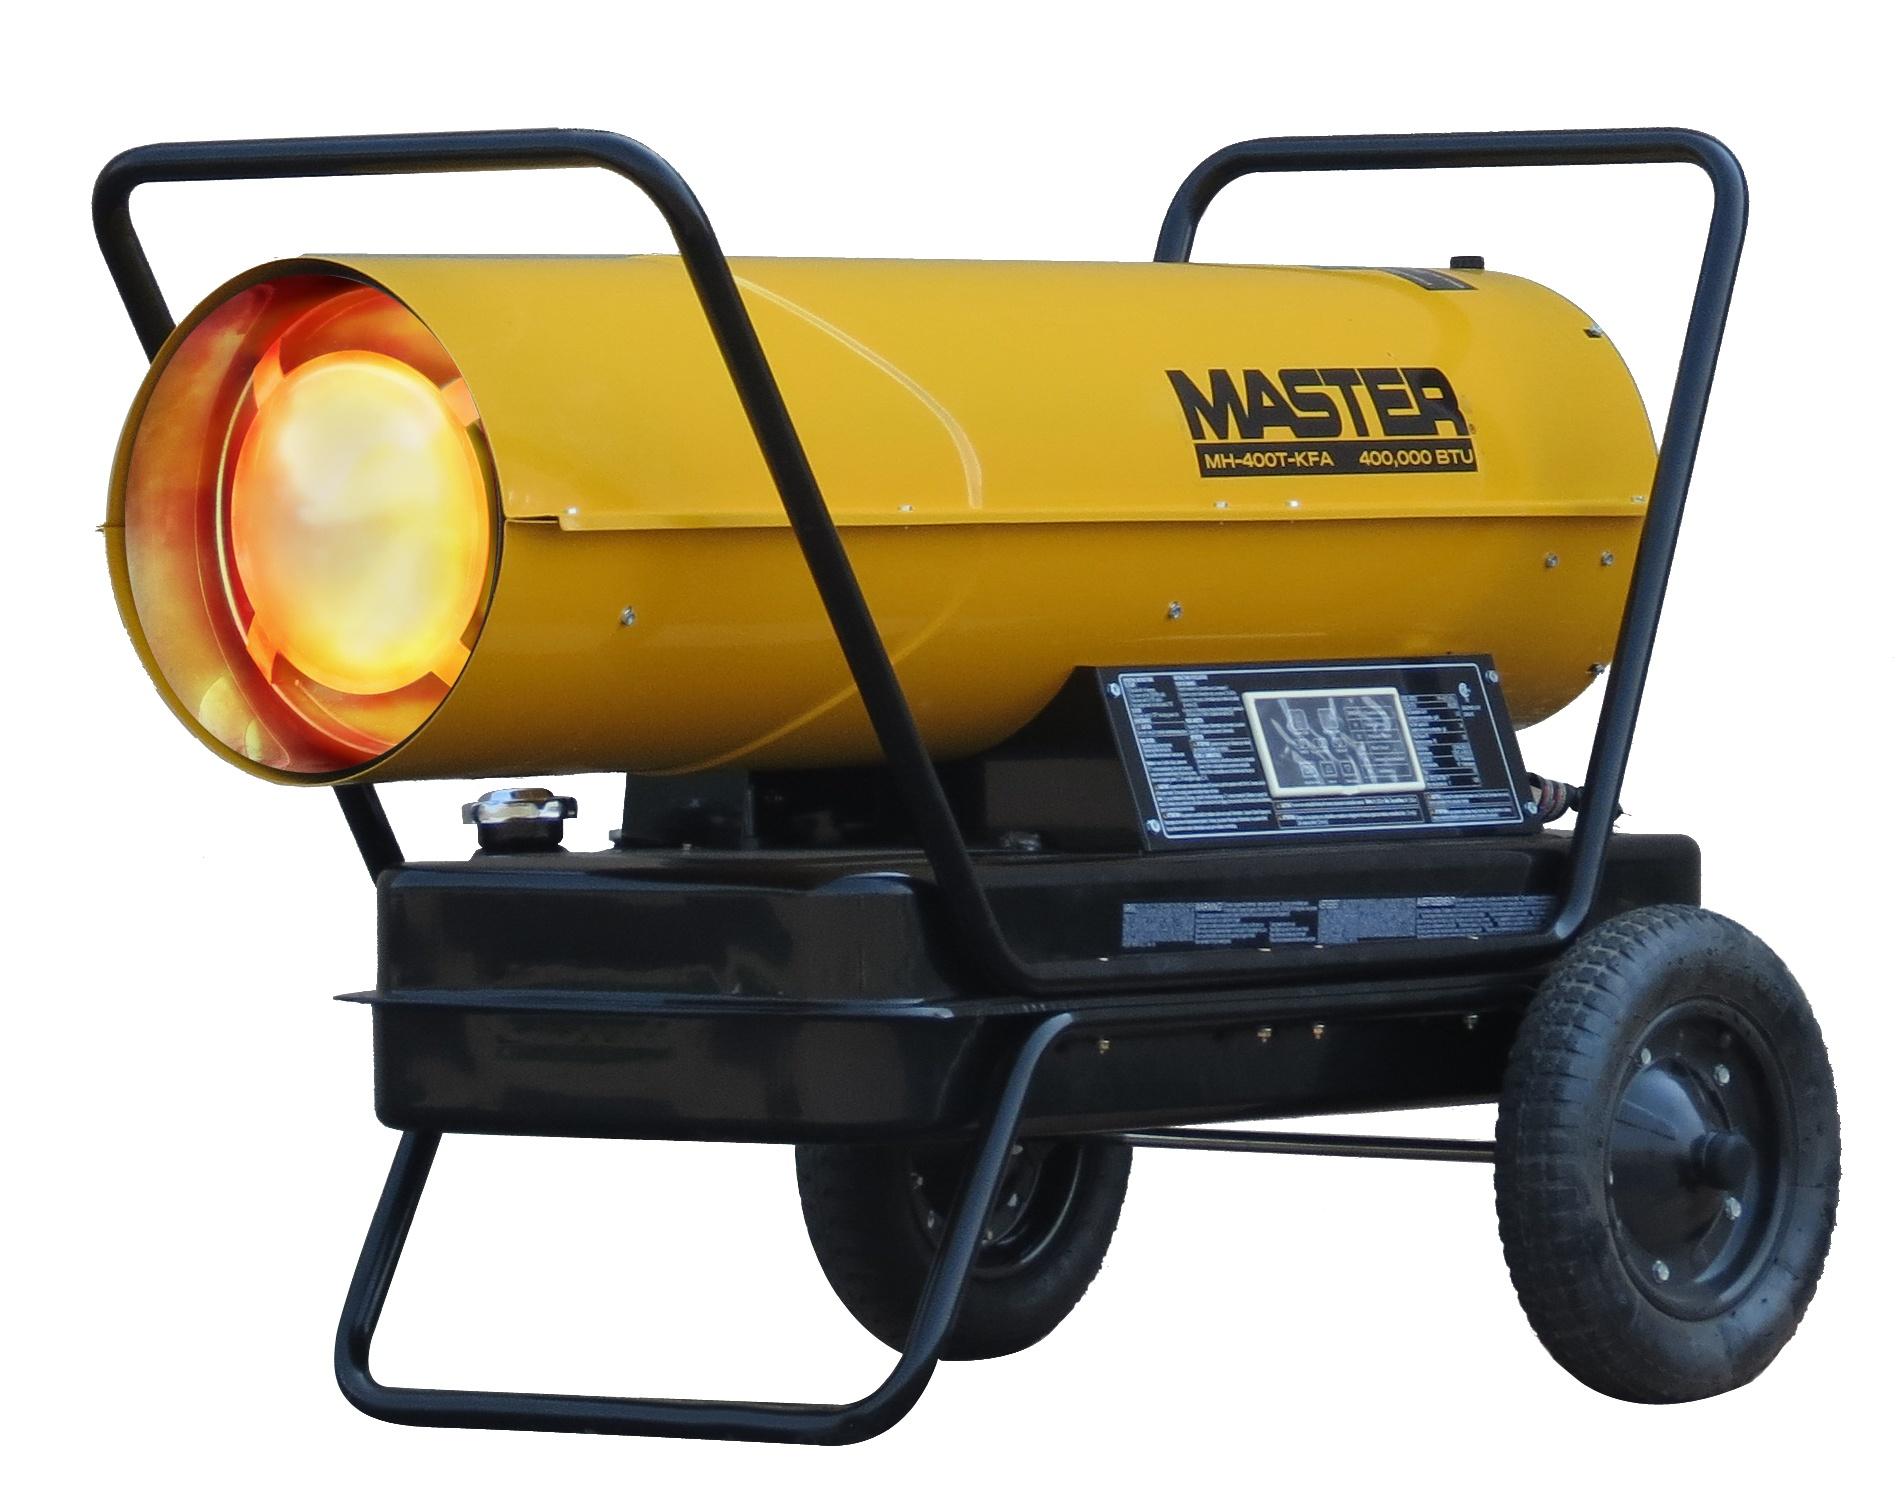 Kerosene Forced Air Heaters 400,000 BTU